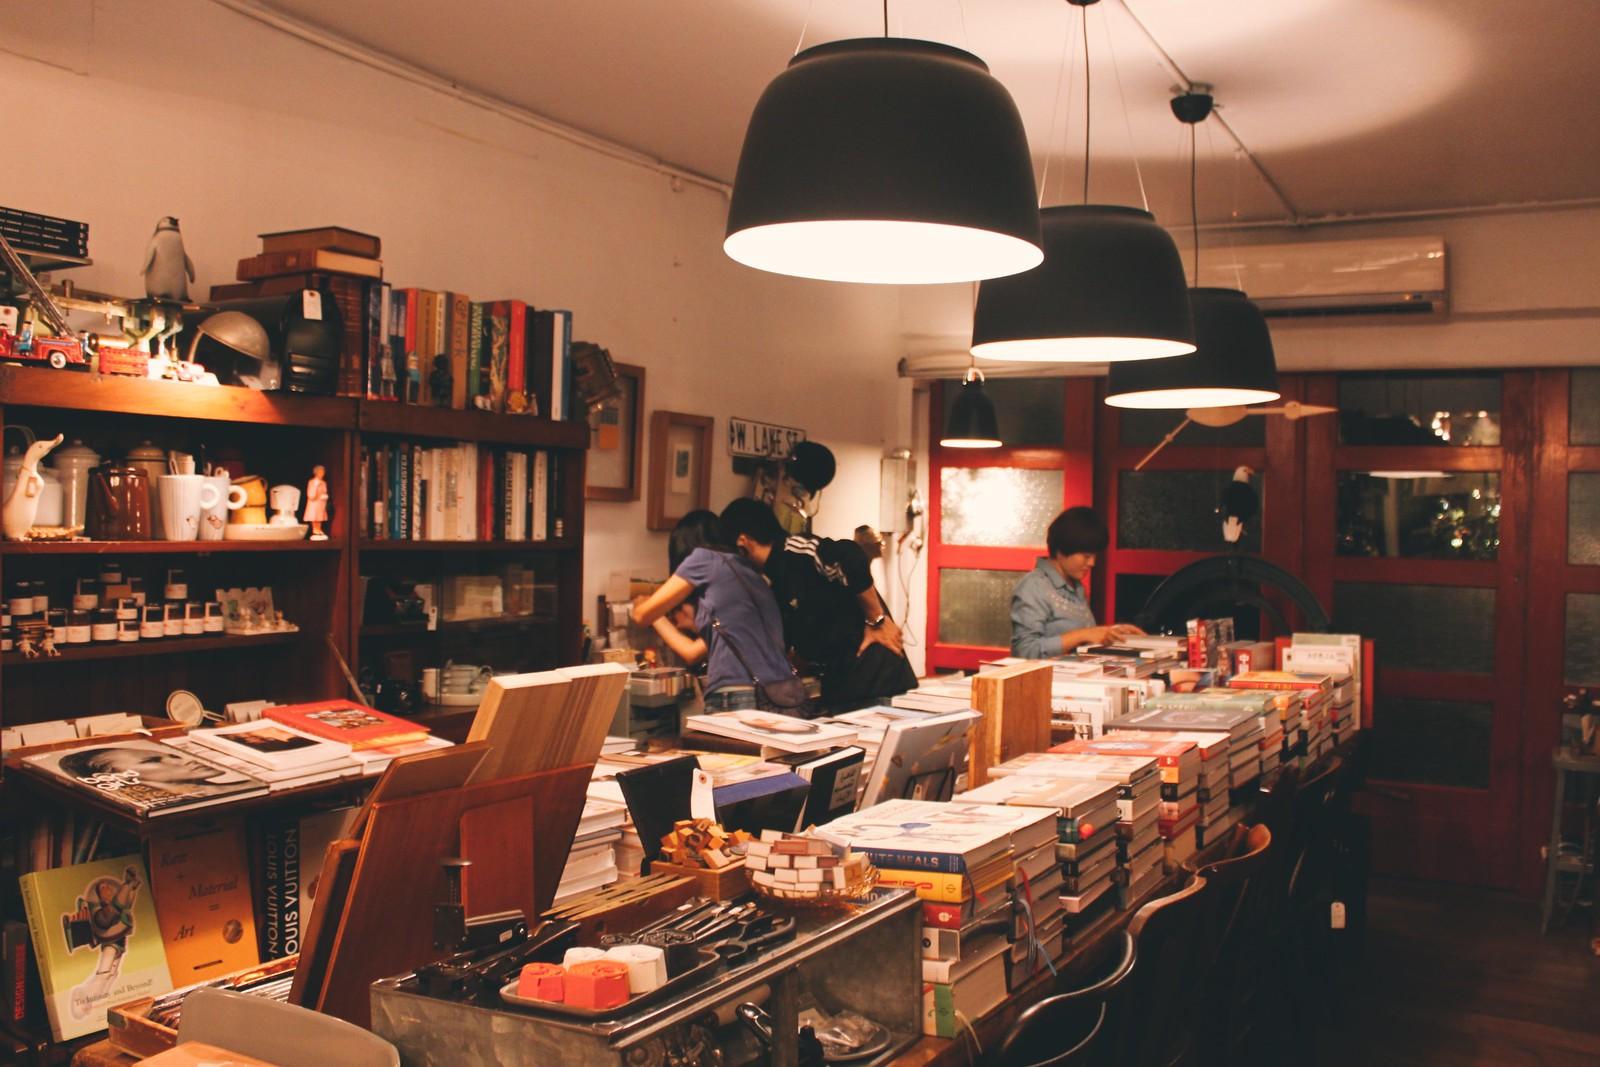 Los libros se apilan en columnas un tanto caóticas en VVG Something